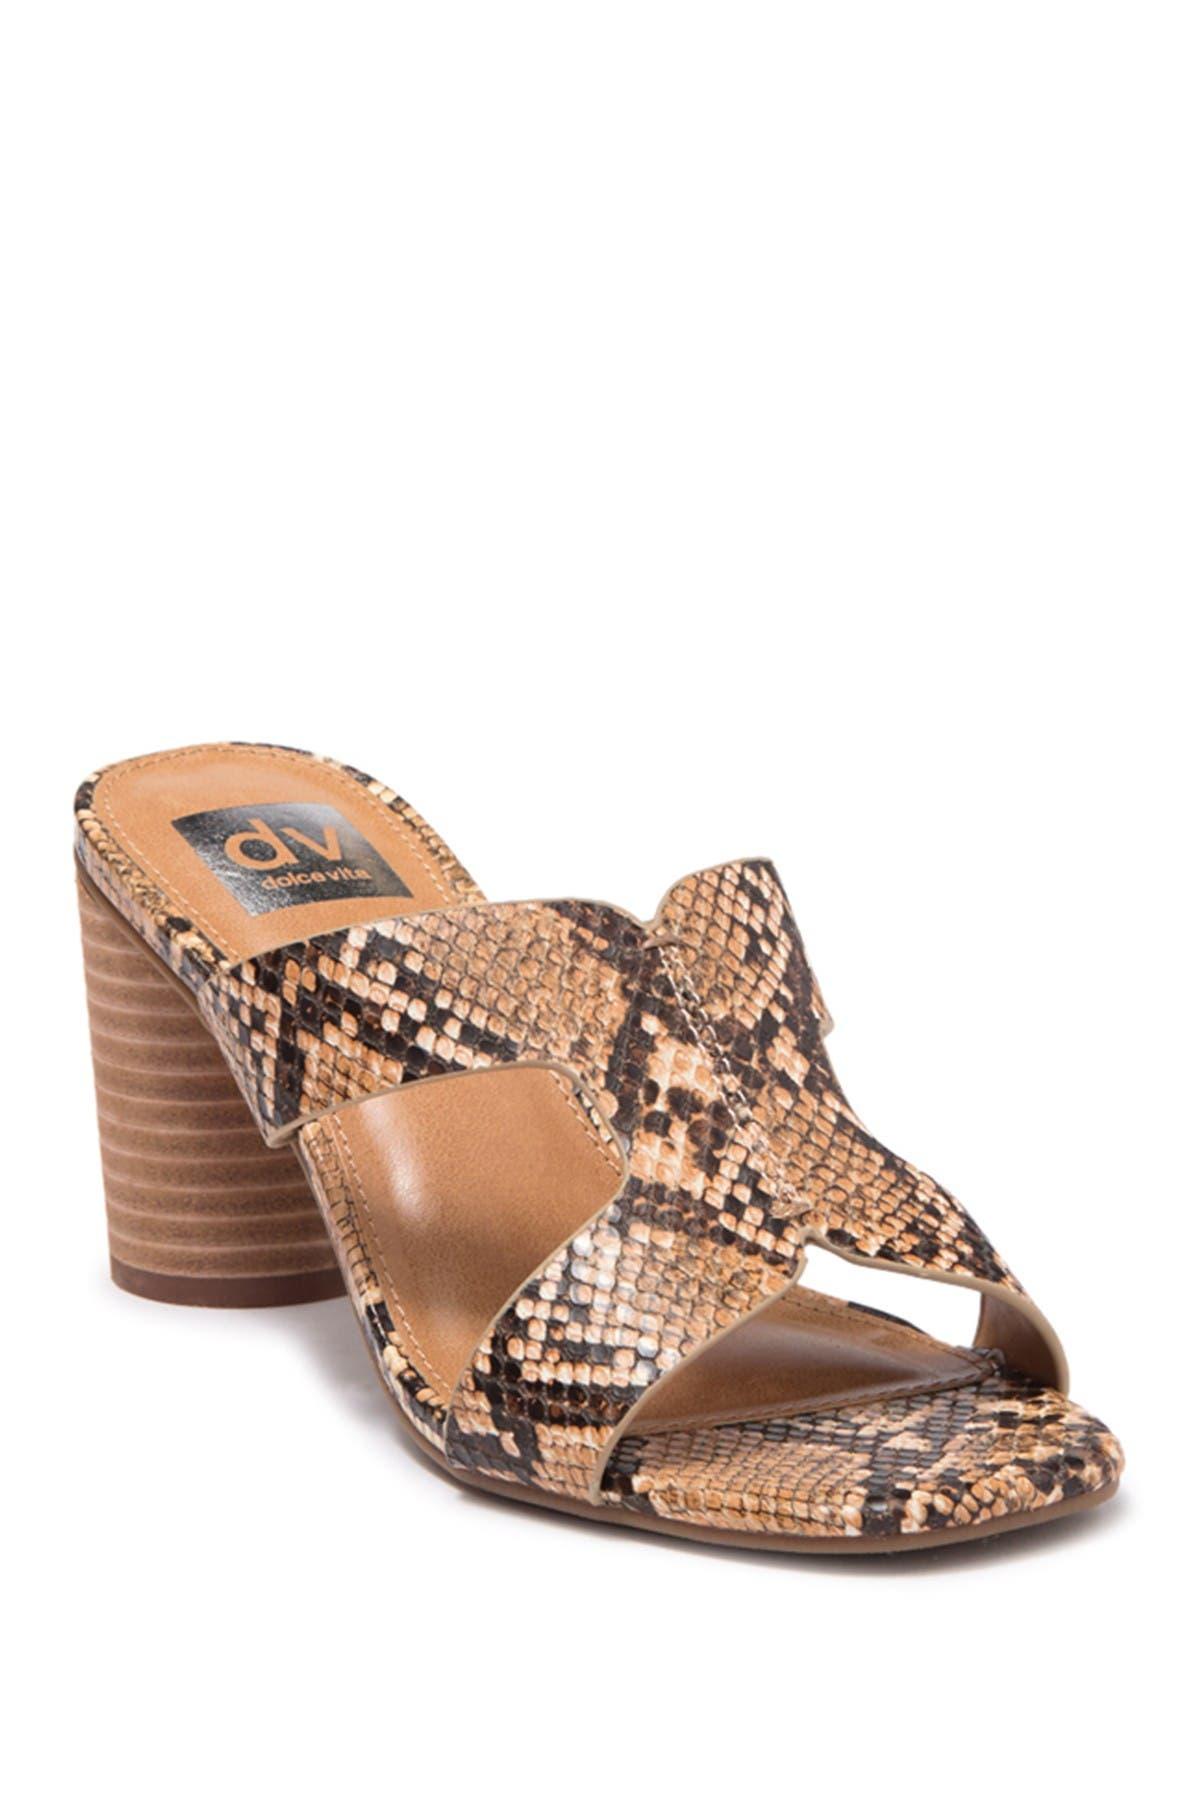 Image of DV DOLCE VITA Maud Block Heel Sandal